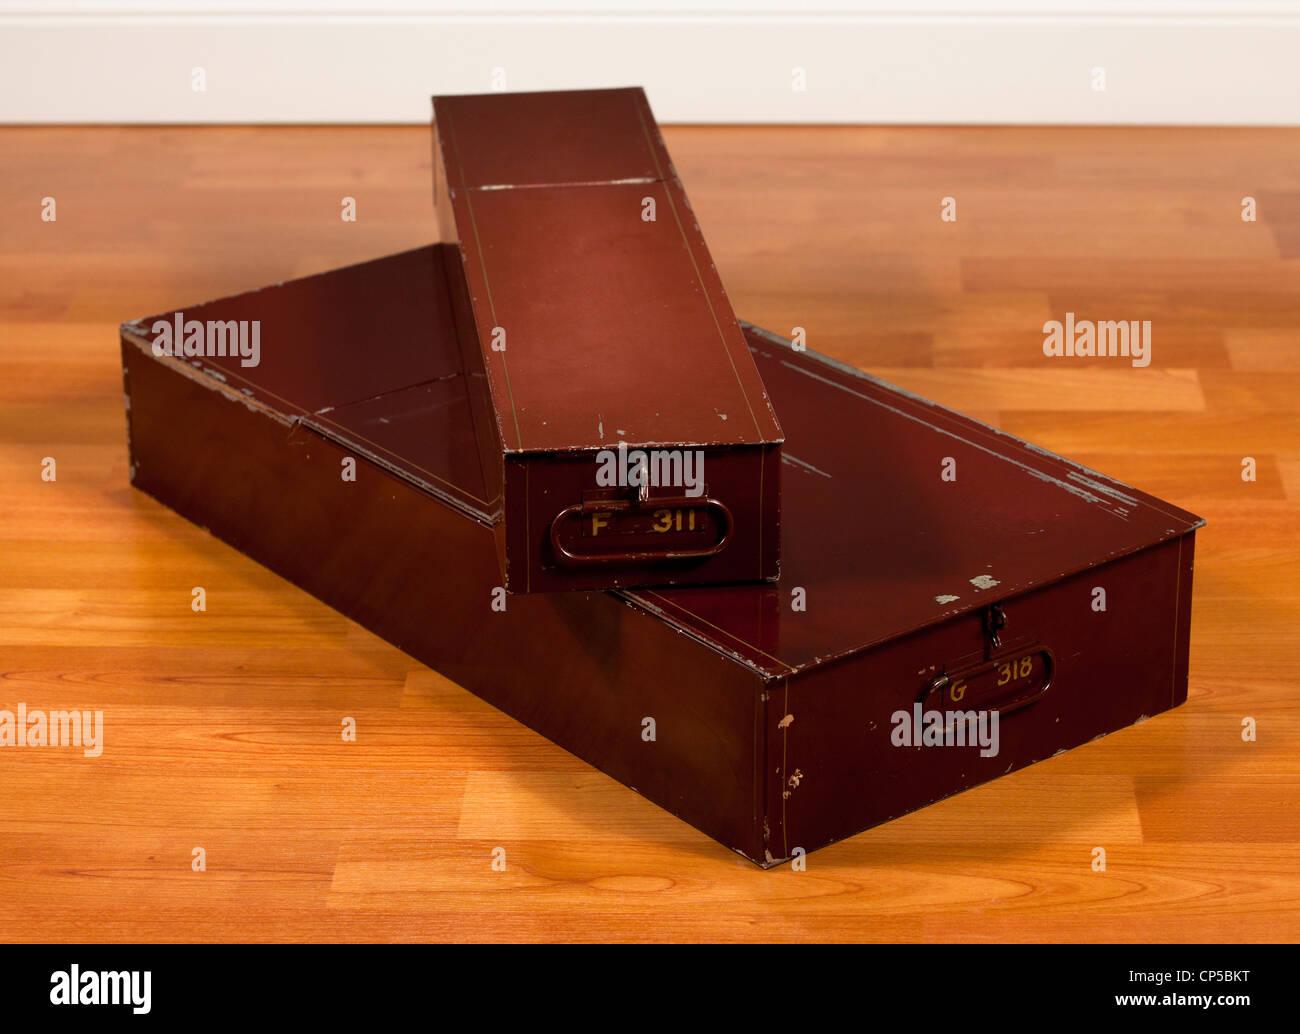 Two sizes of bank safe deposit boxes - Stock Image